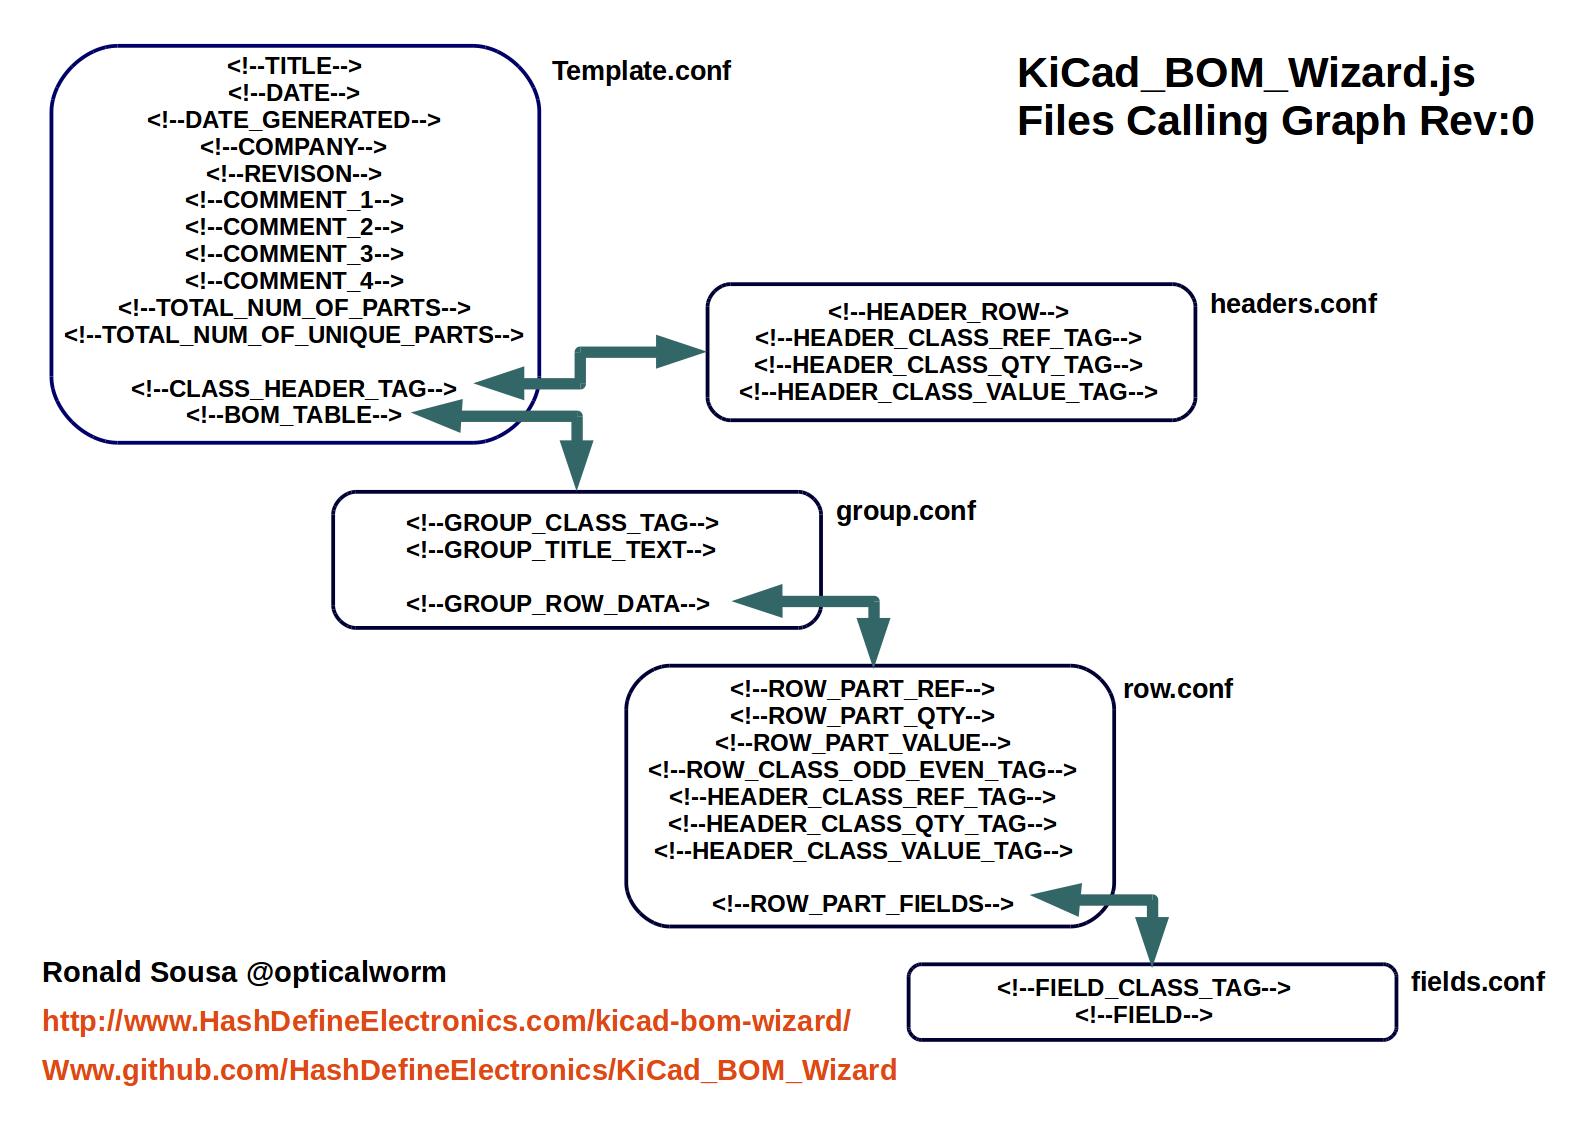 Cad_BOM_Wizard Calling Graph Rev_0